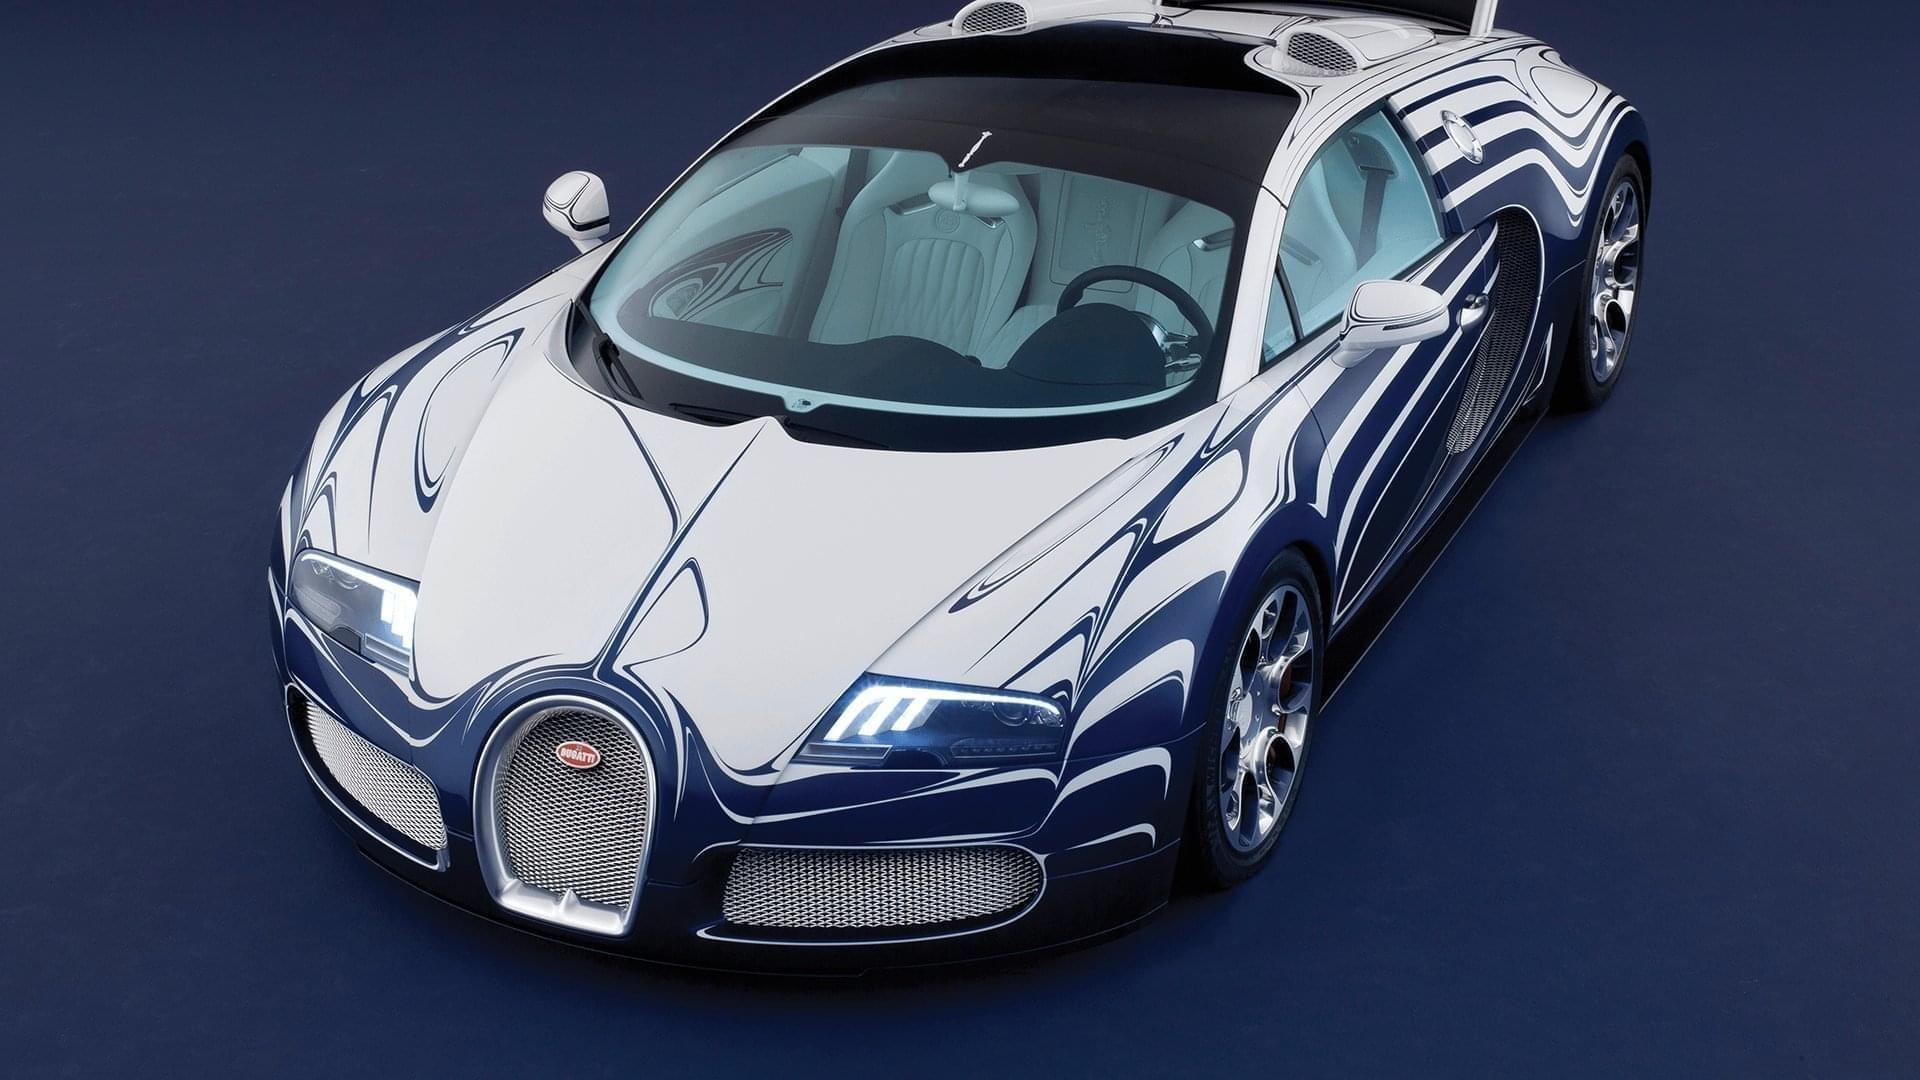 Bugatti W16 Engine Diagram L Blanc Bugatti Editions Models Of Bugatti W16 Engine Diagram